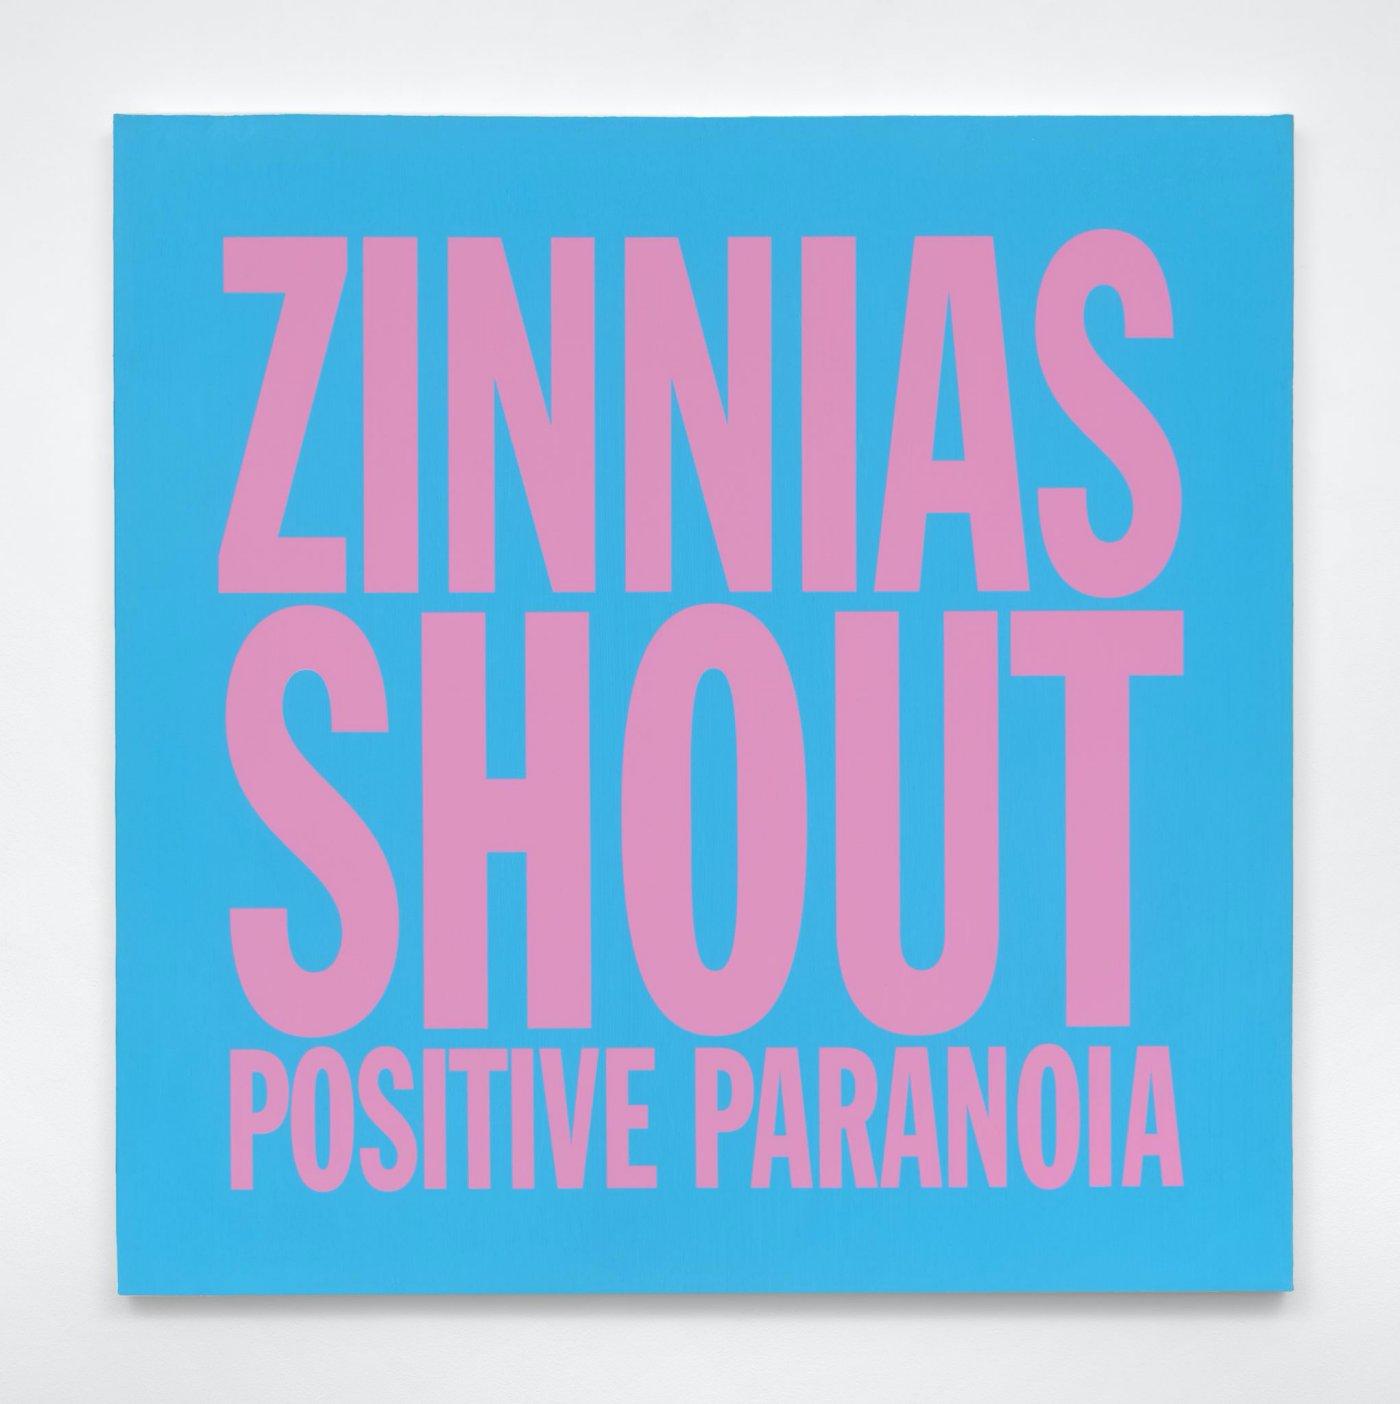 ZINNIAS SHOUT POSITIVE PARANOIA